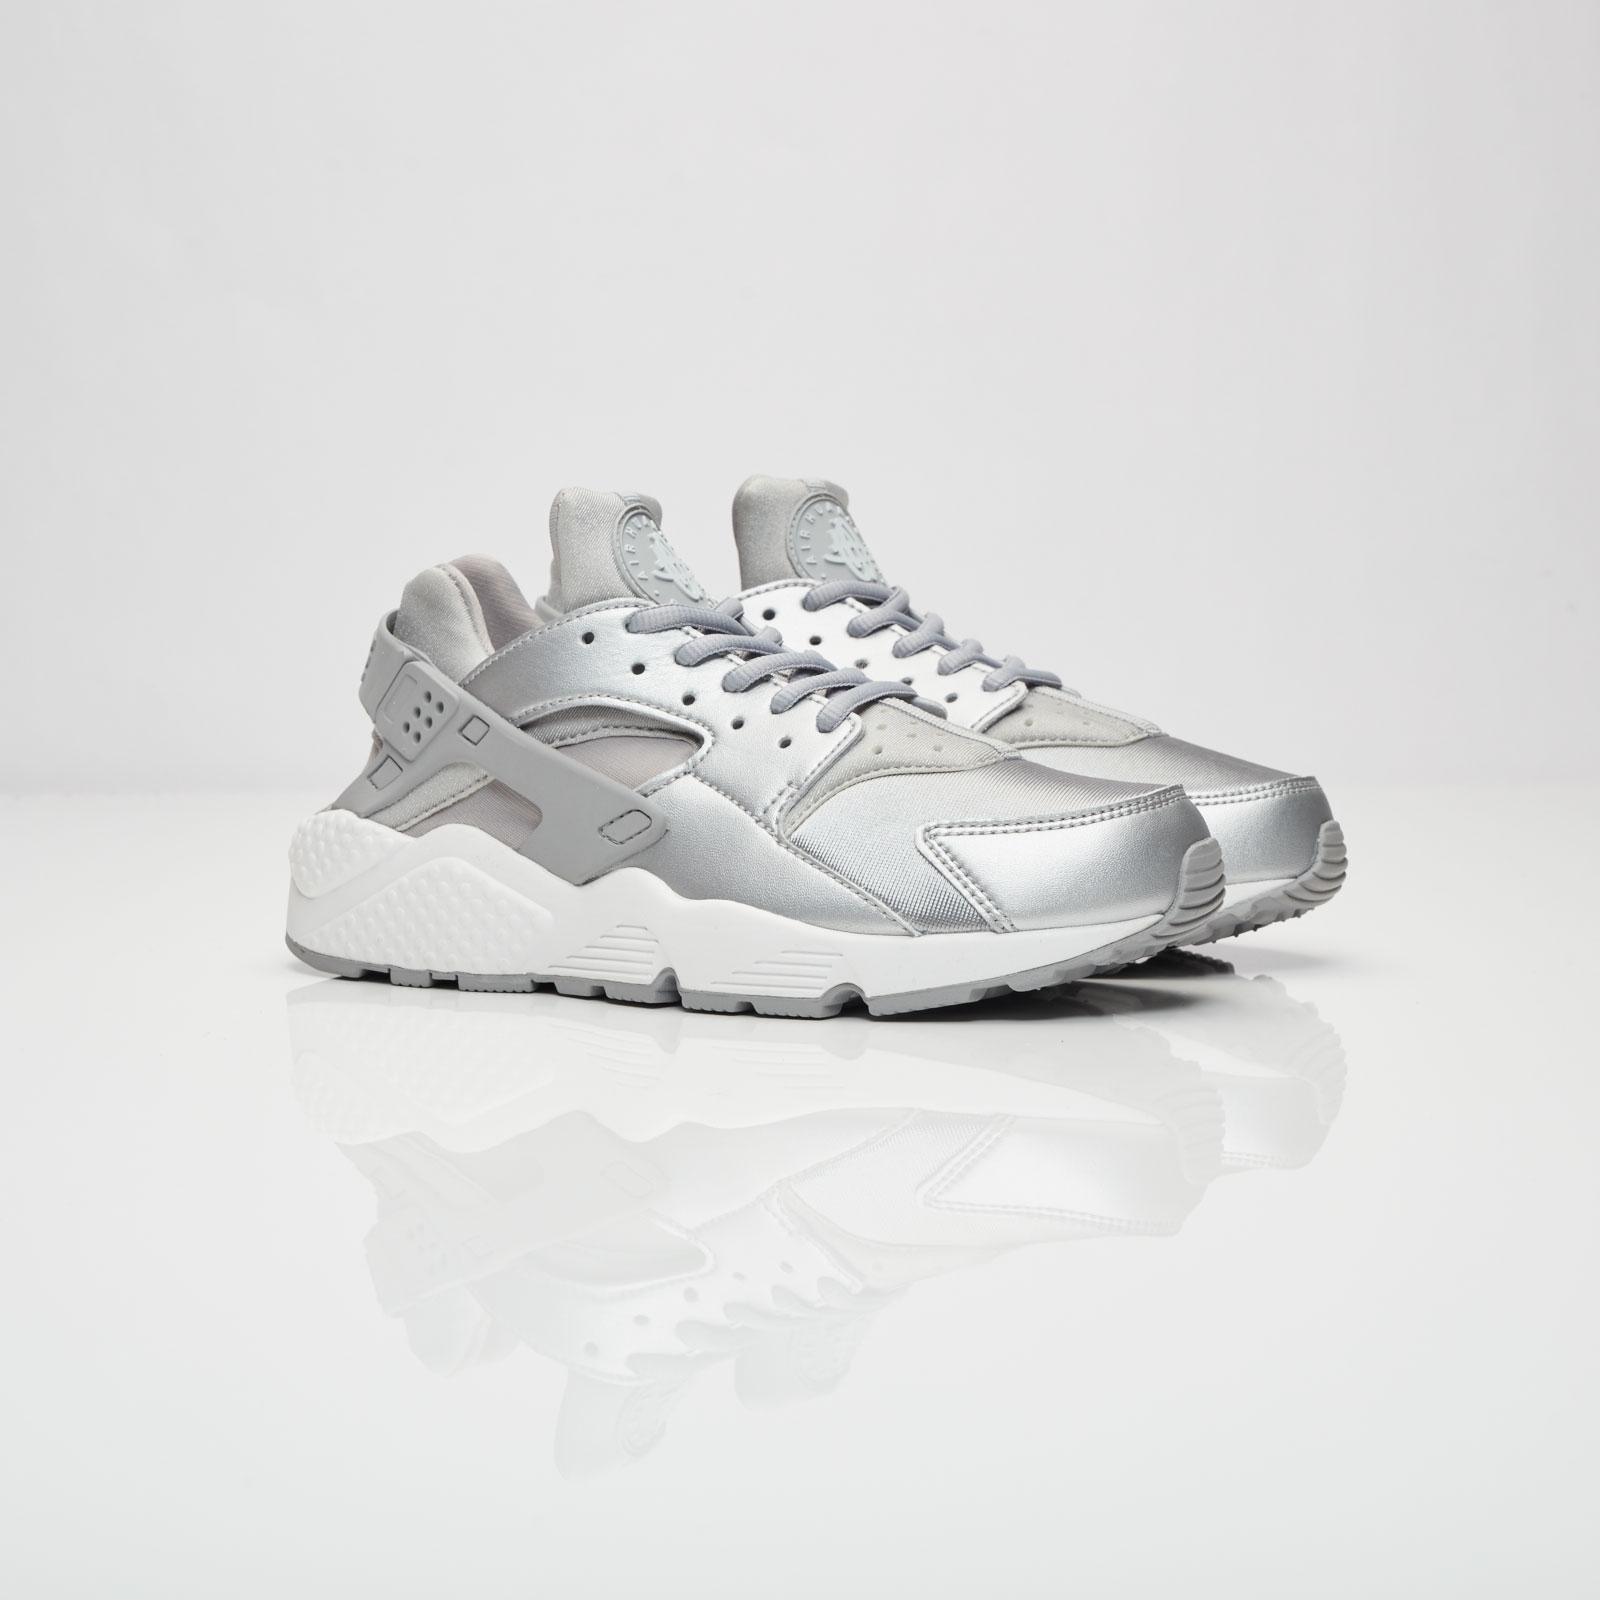 2f5c5347a05f1 Nike Wmns Air Huarache Run SE - 859429-002 - Sneakersnstuff ...